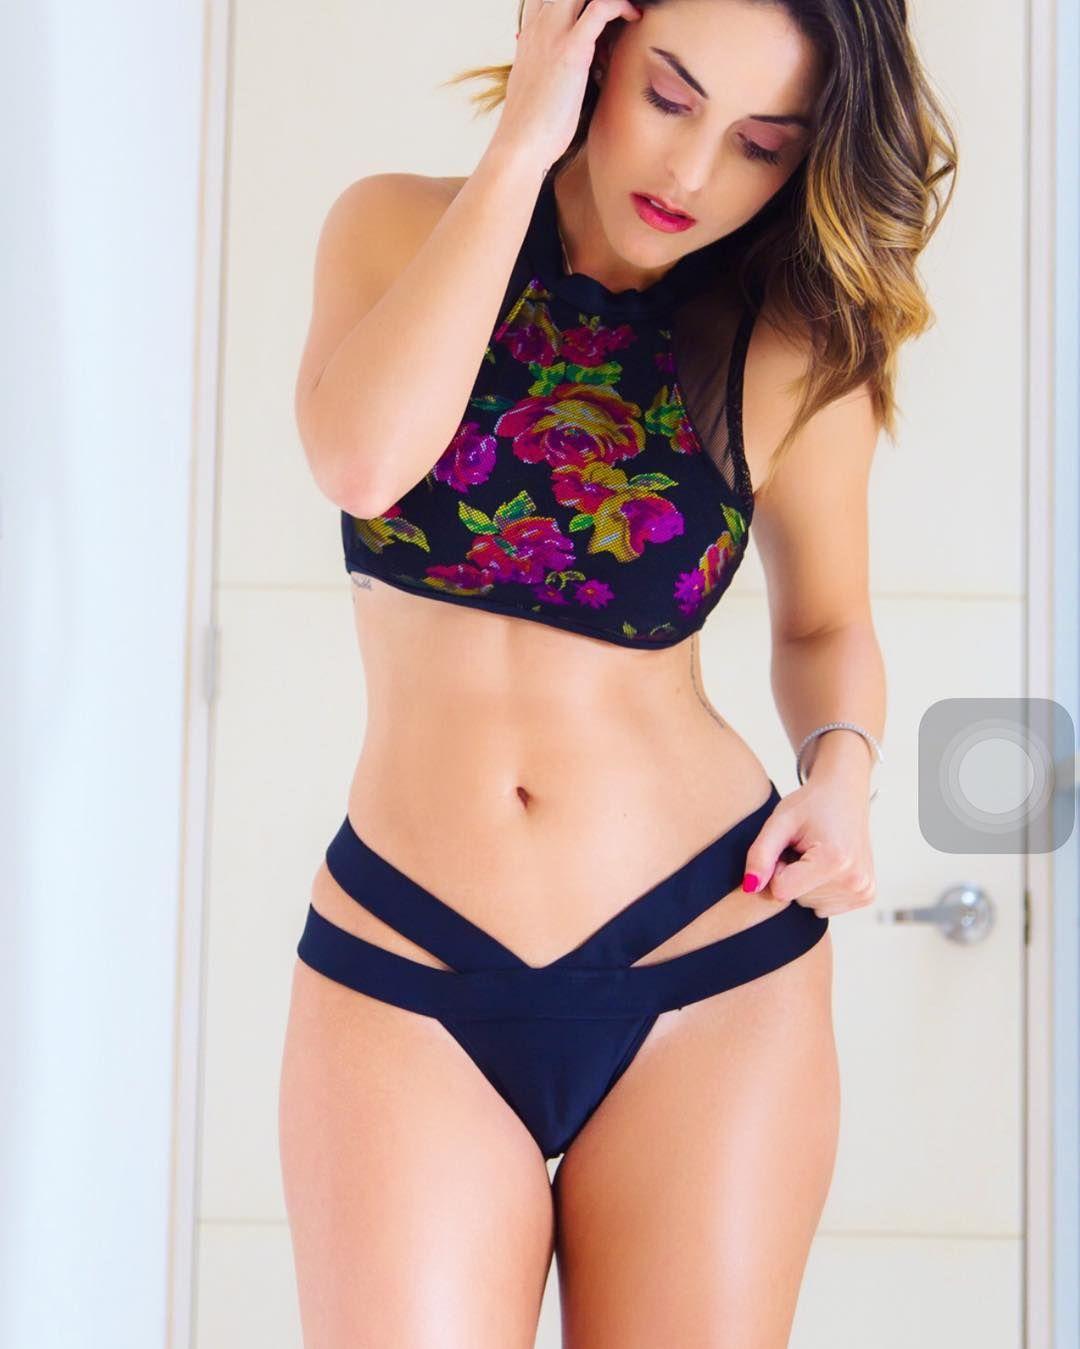 Snapchat Patty Lopez de la Cerda nude (18 foto and video), Sexy, Fappening, Feet, legs 2020